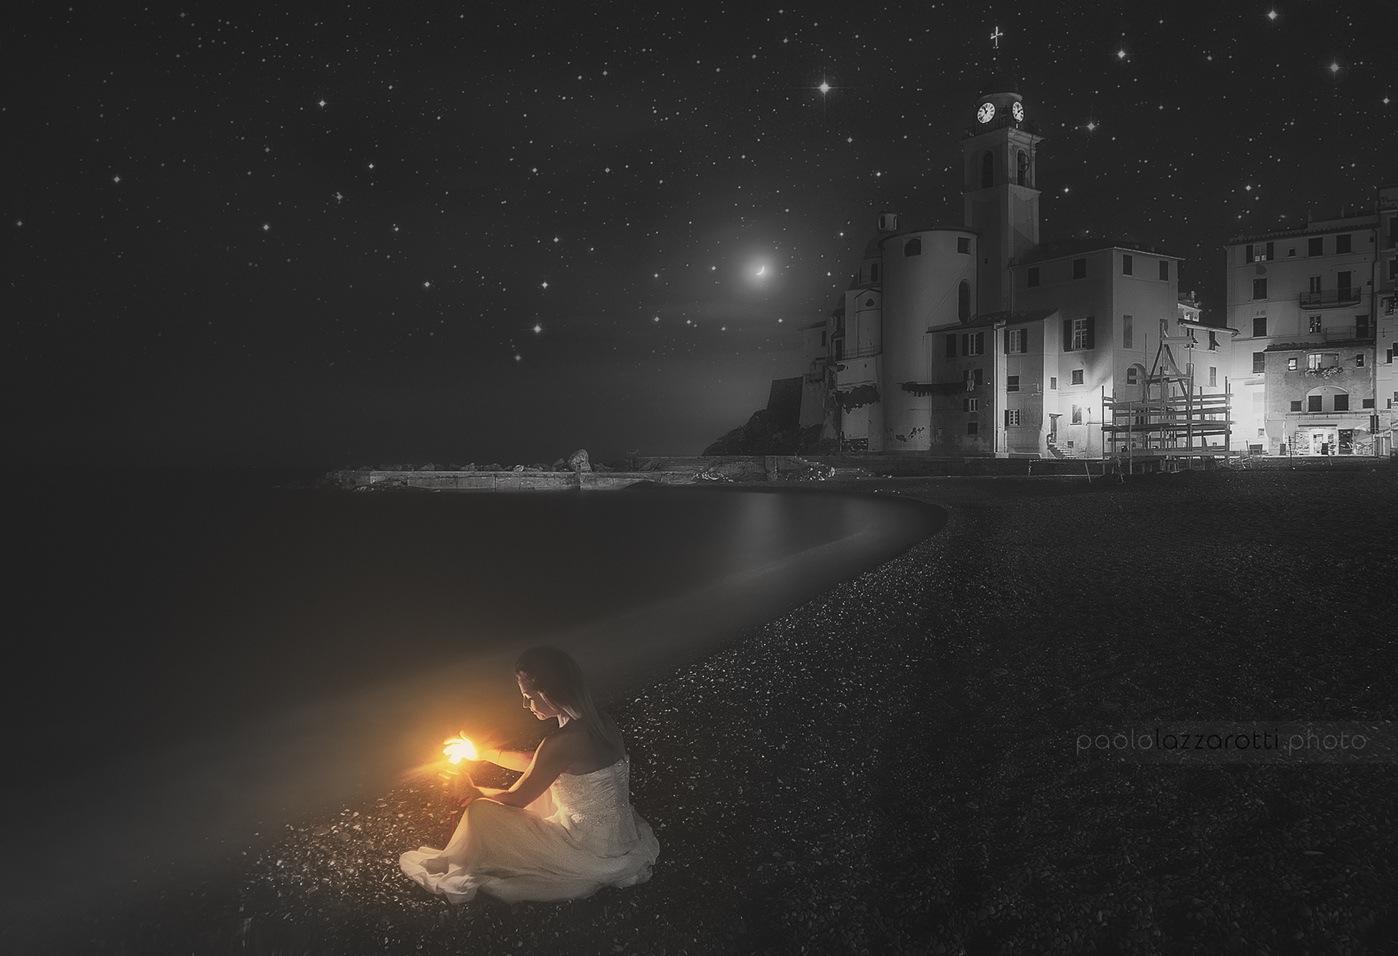 Black Sea by Paolo Lazzarotti